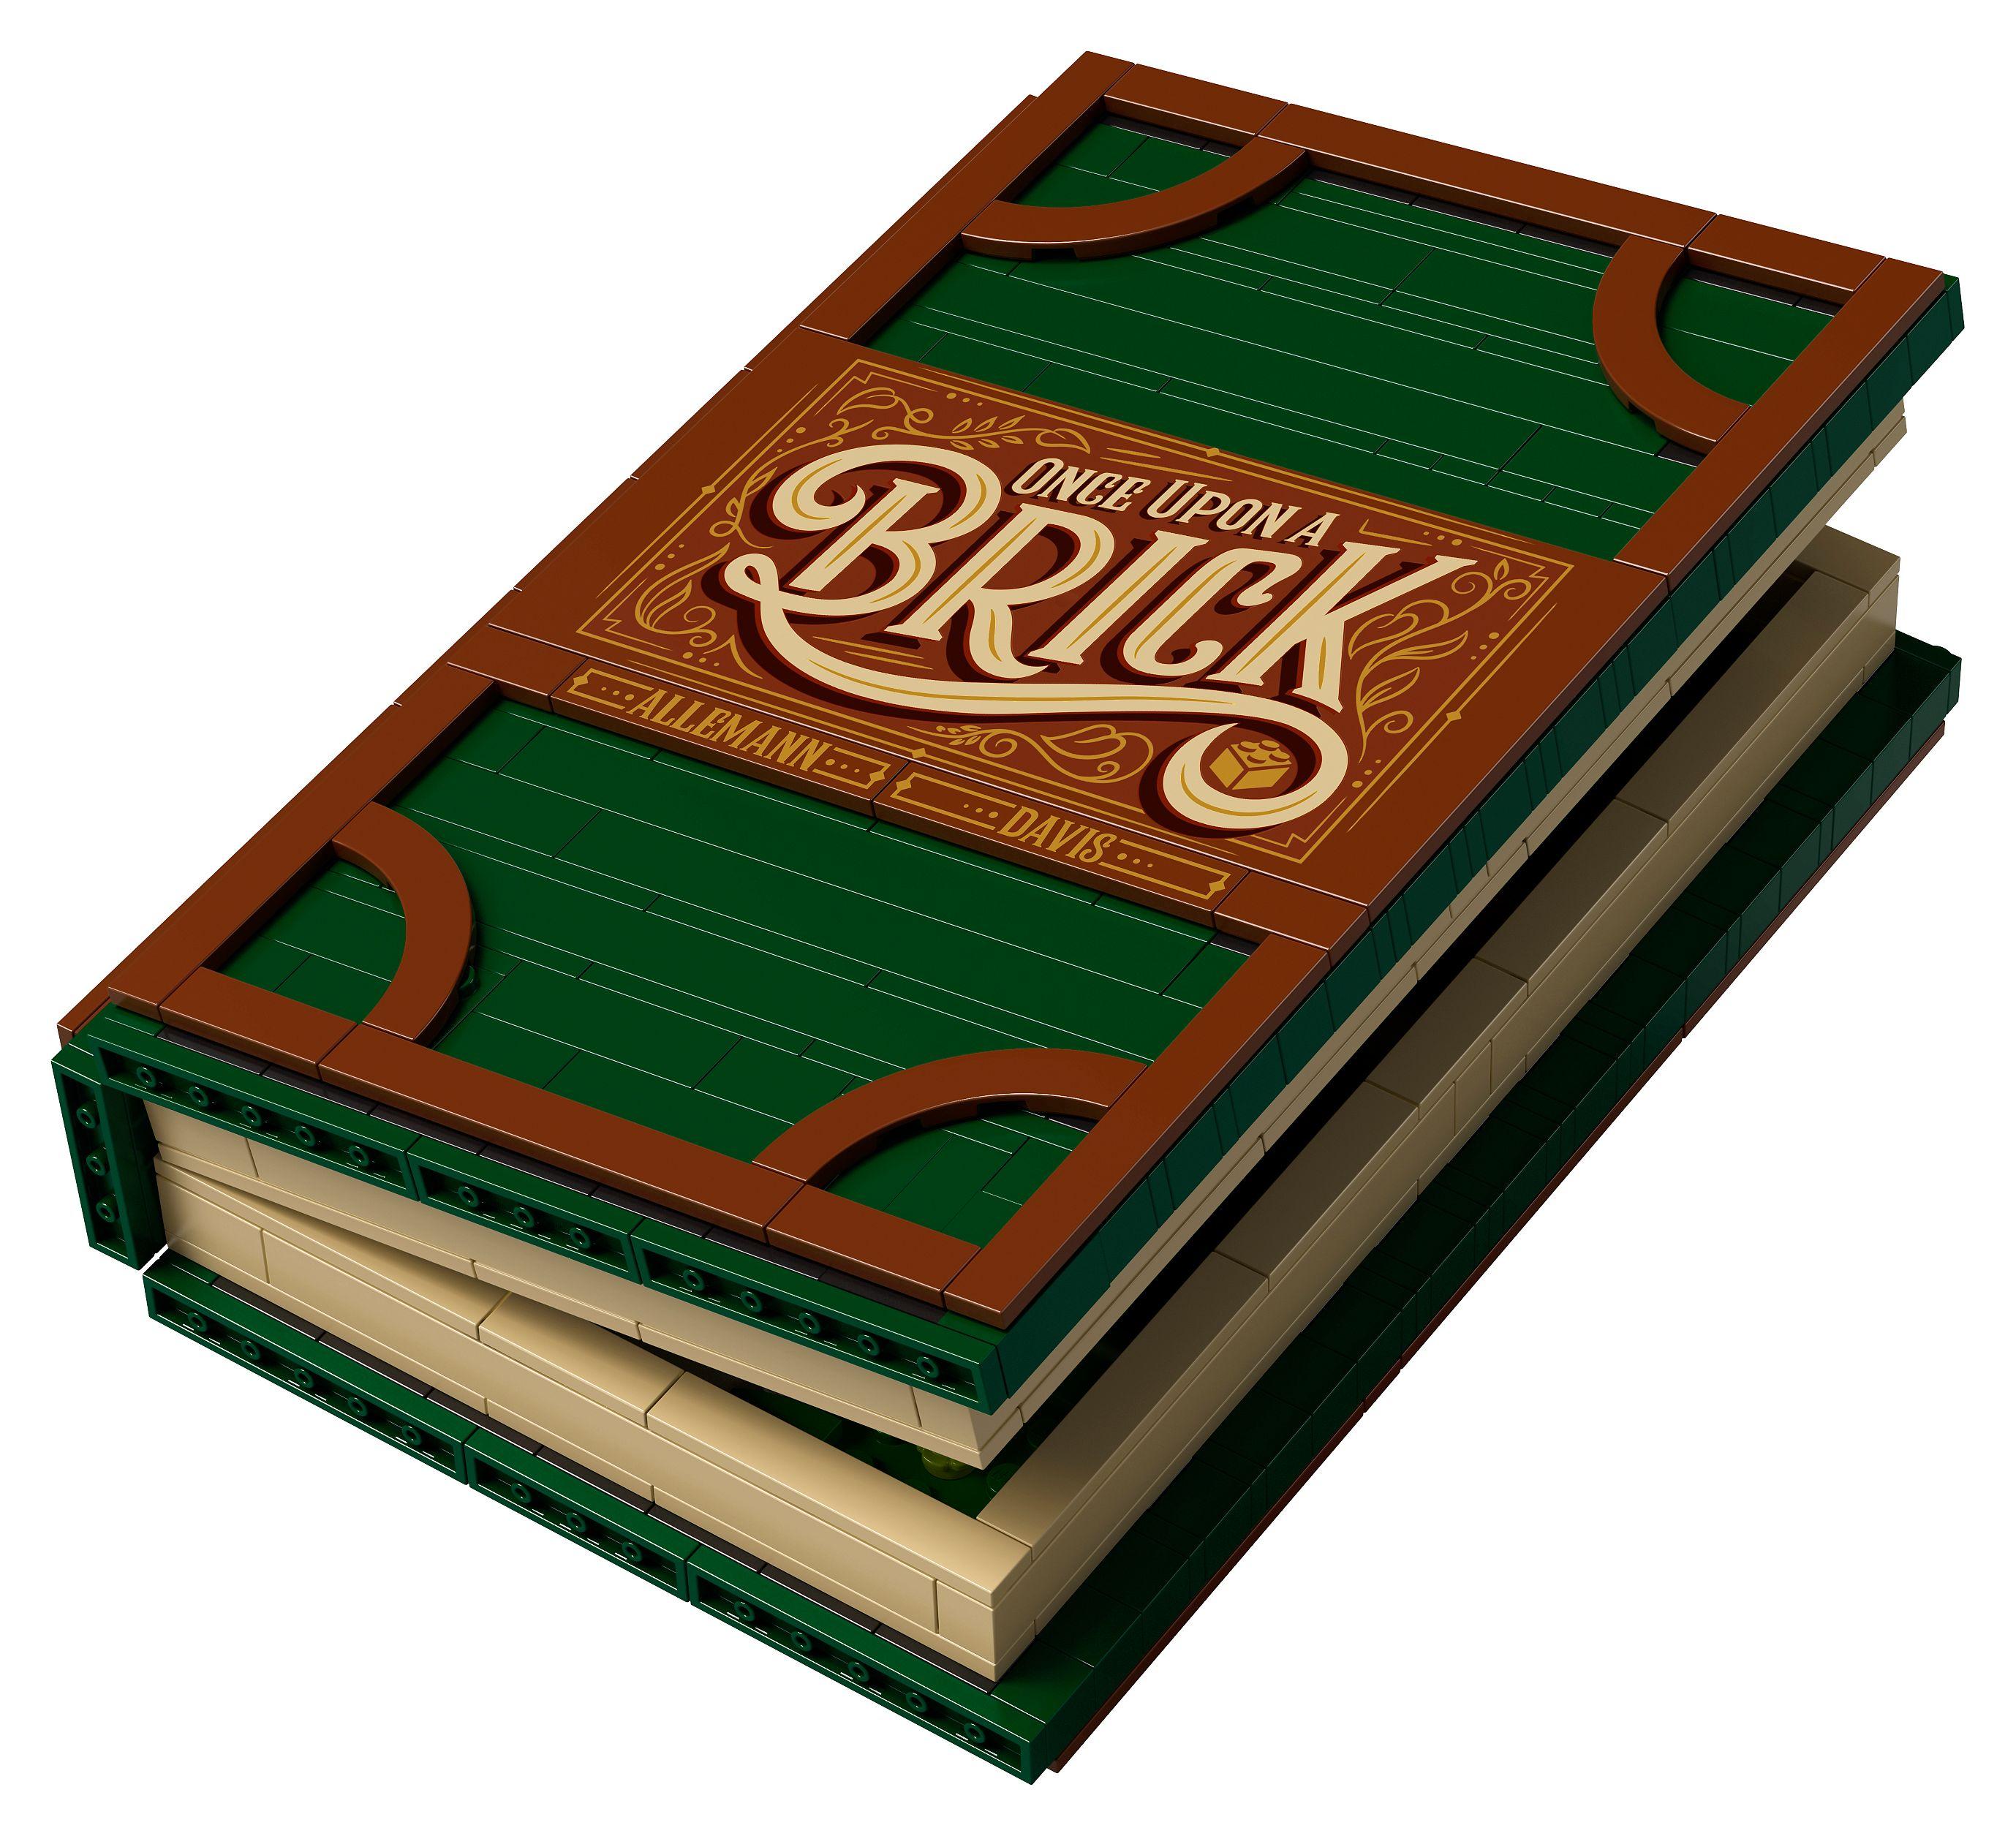 LEGO Ideas 21315 Pop Up Book 30% off £41.99 @ LEGO Shop Instore & Online